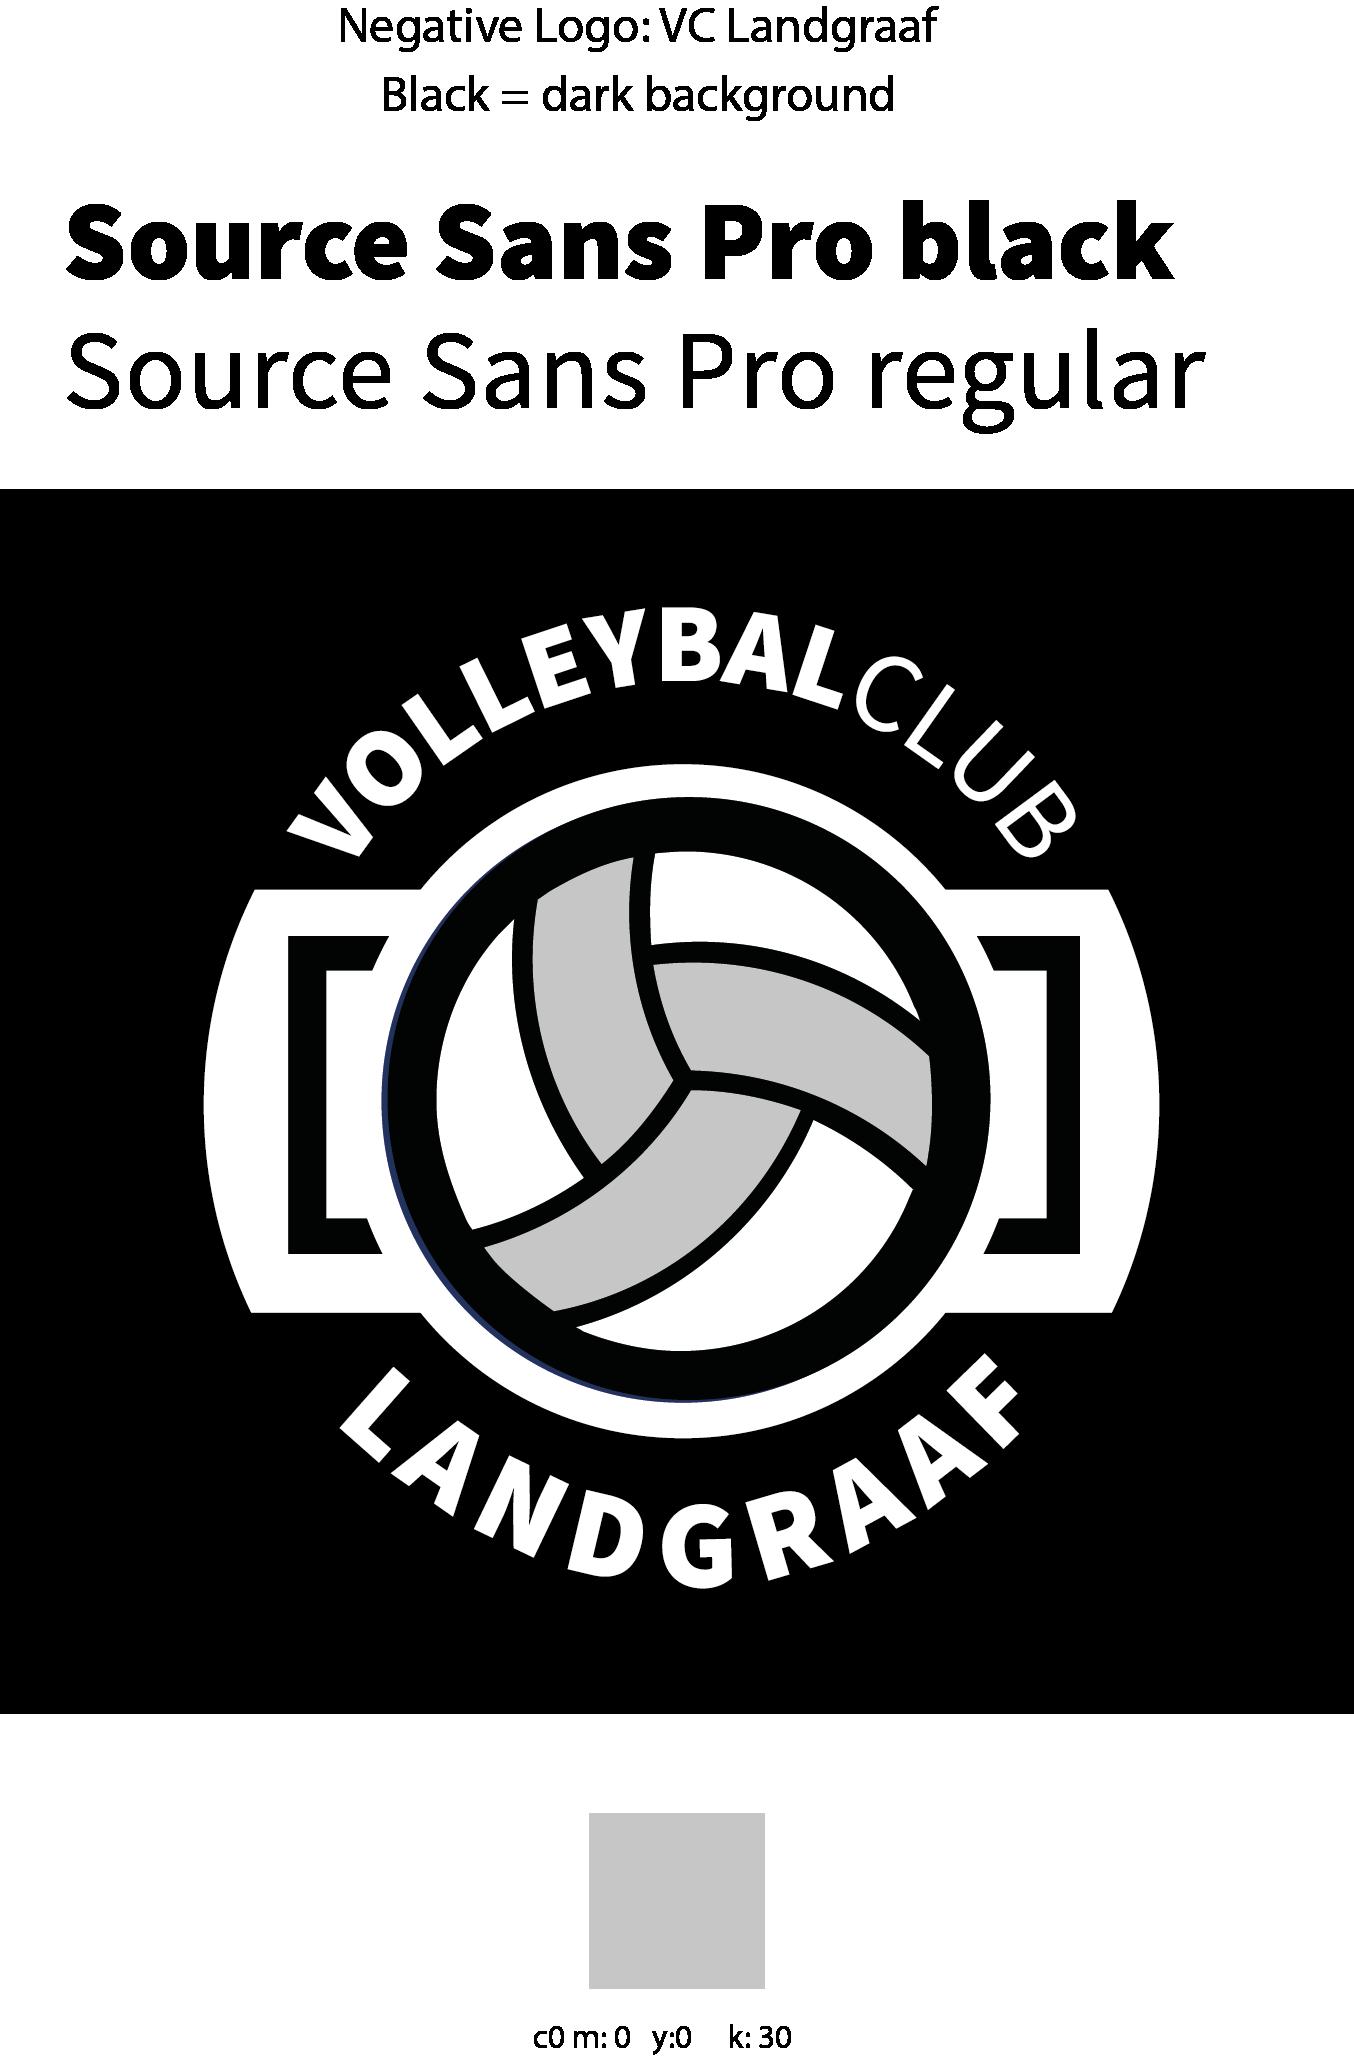 VCL_Logo_negatief_site_example